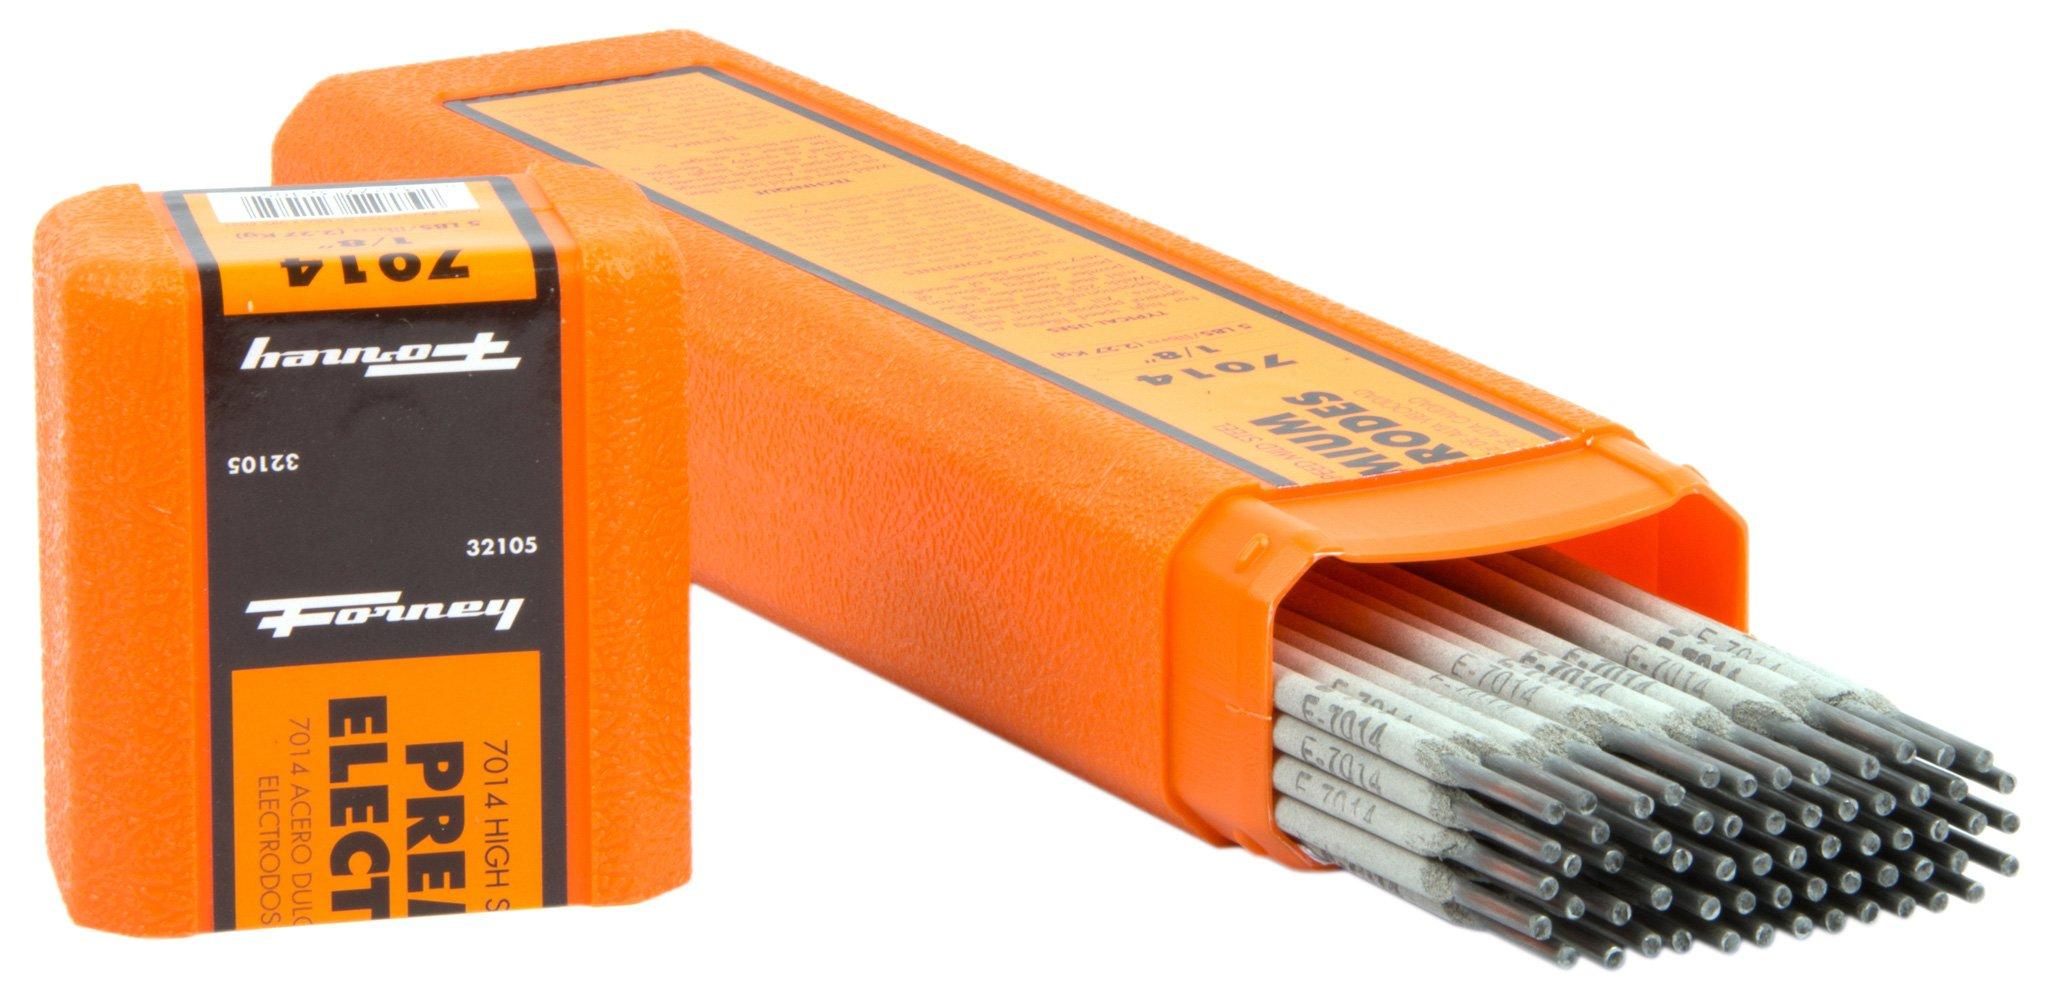 Forney 32105 E7014 Welding Rod, 1/8-Inch, 5-Pound